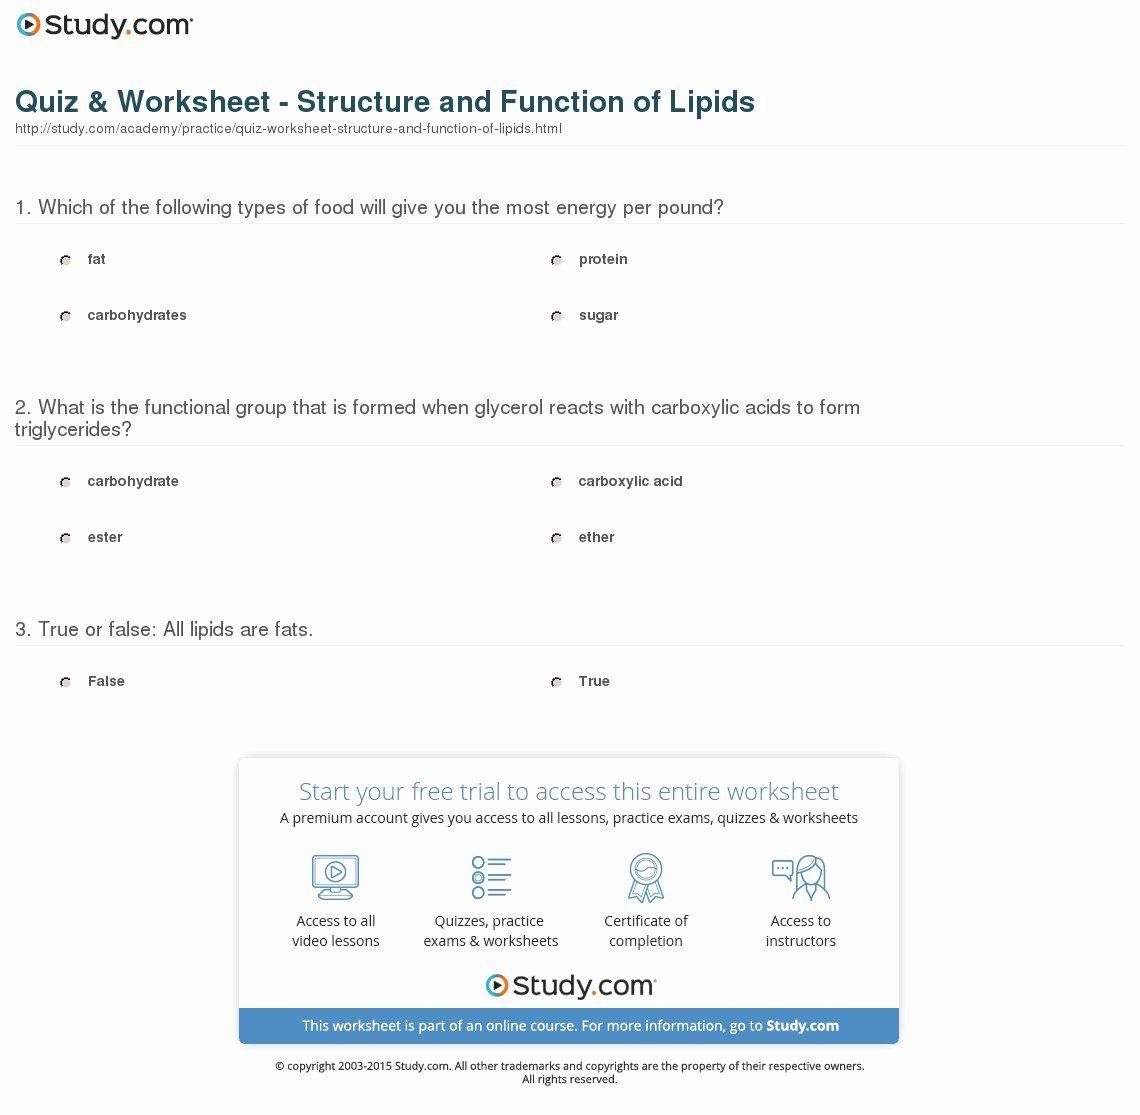 Lipids Worksheet Answer Key Lovely Lipid Worksheet Answer